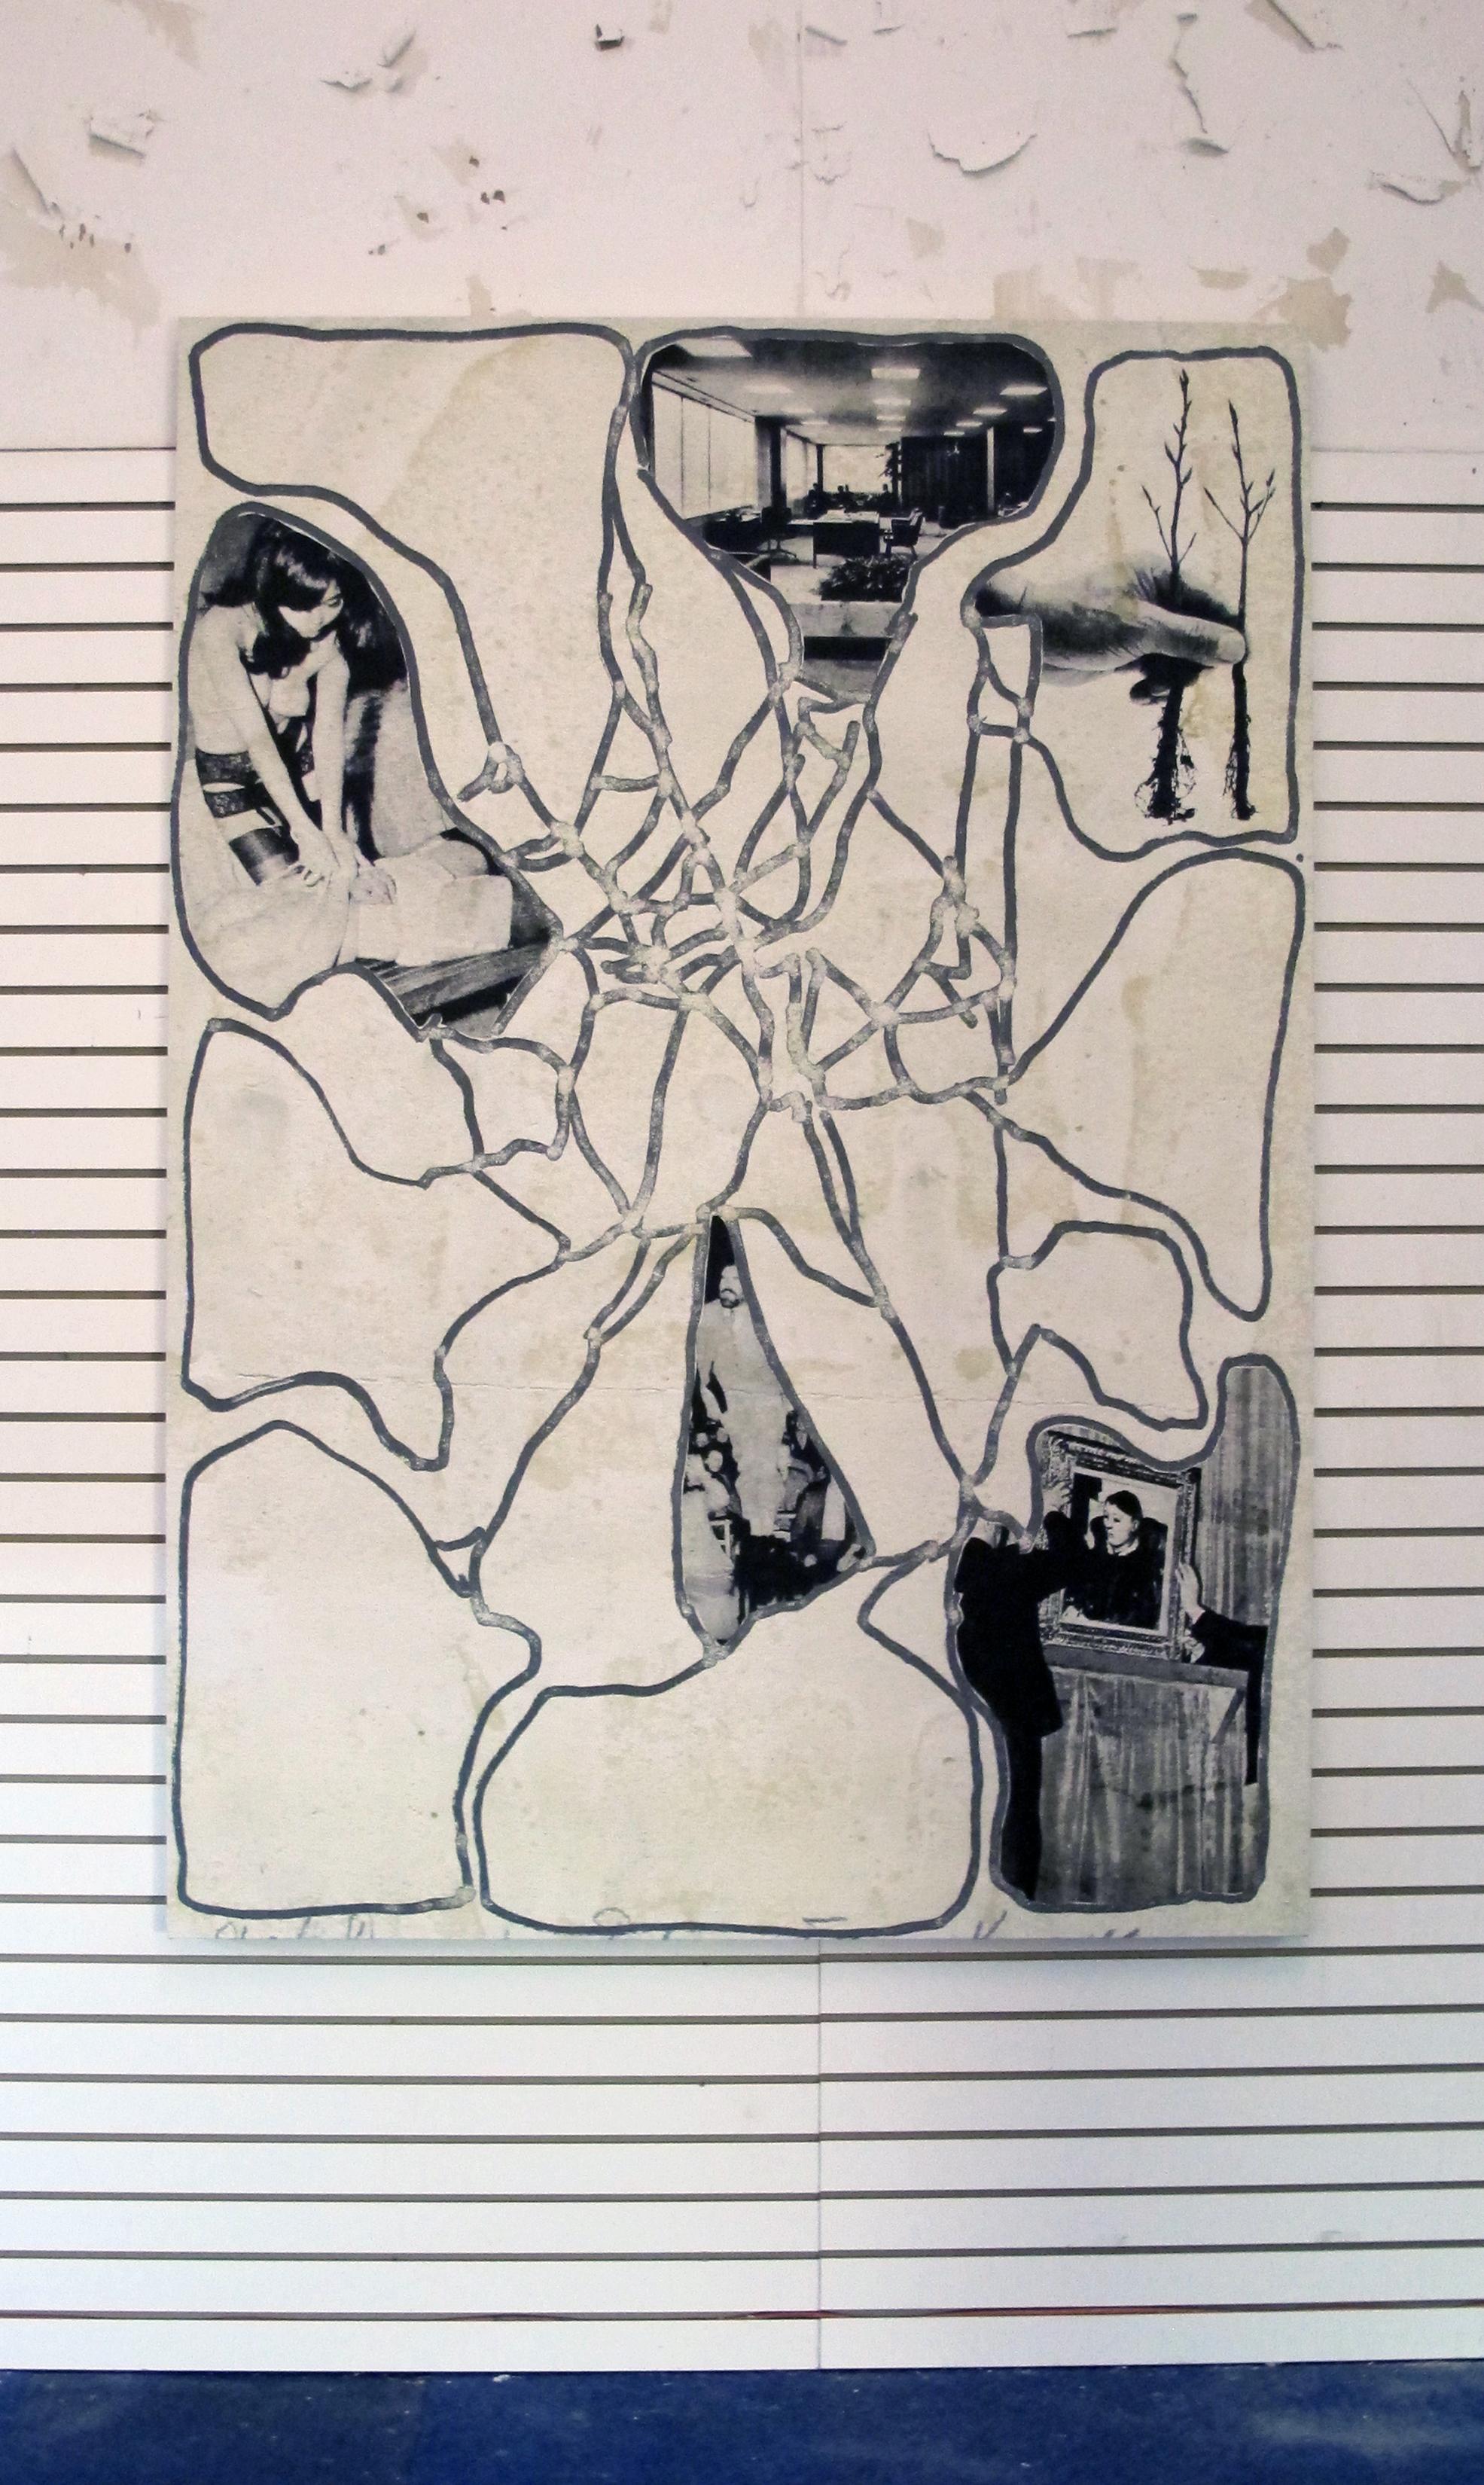 Freeman-Lowe, PANOPTICUM, Robert Miller Gallery, Installation View 13.jpg